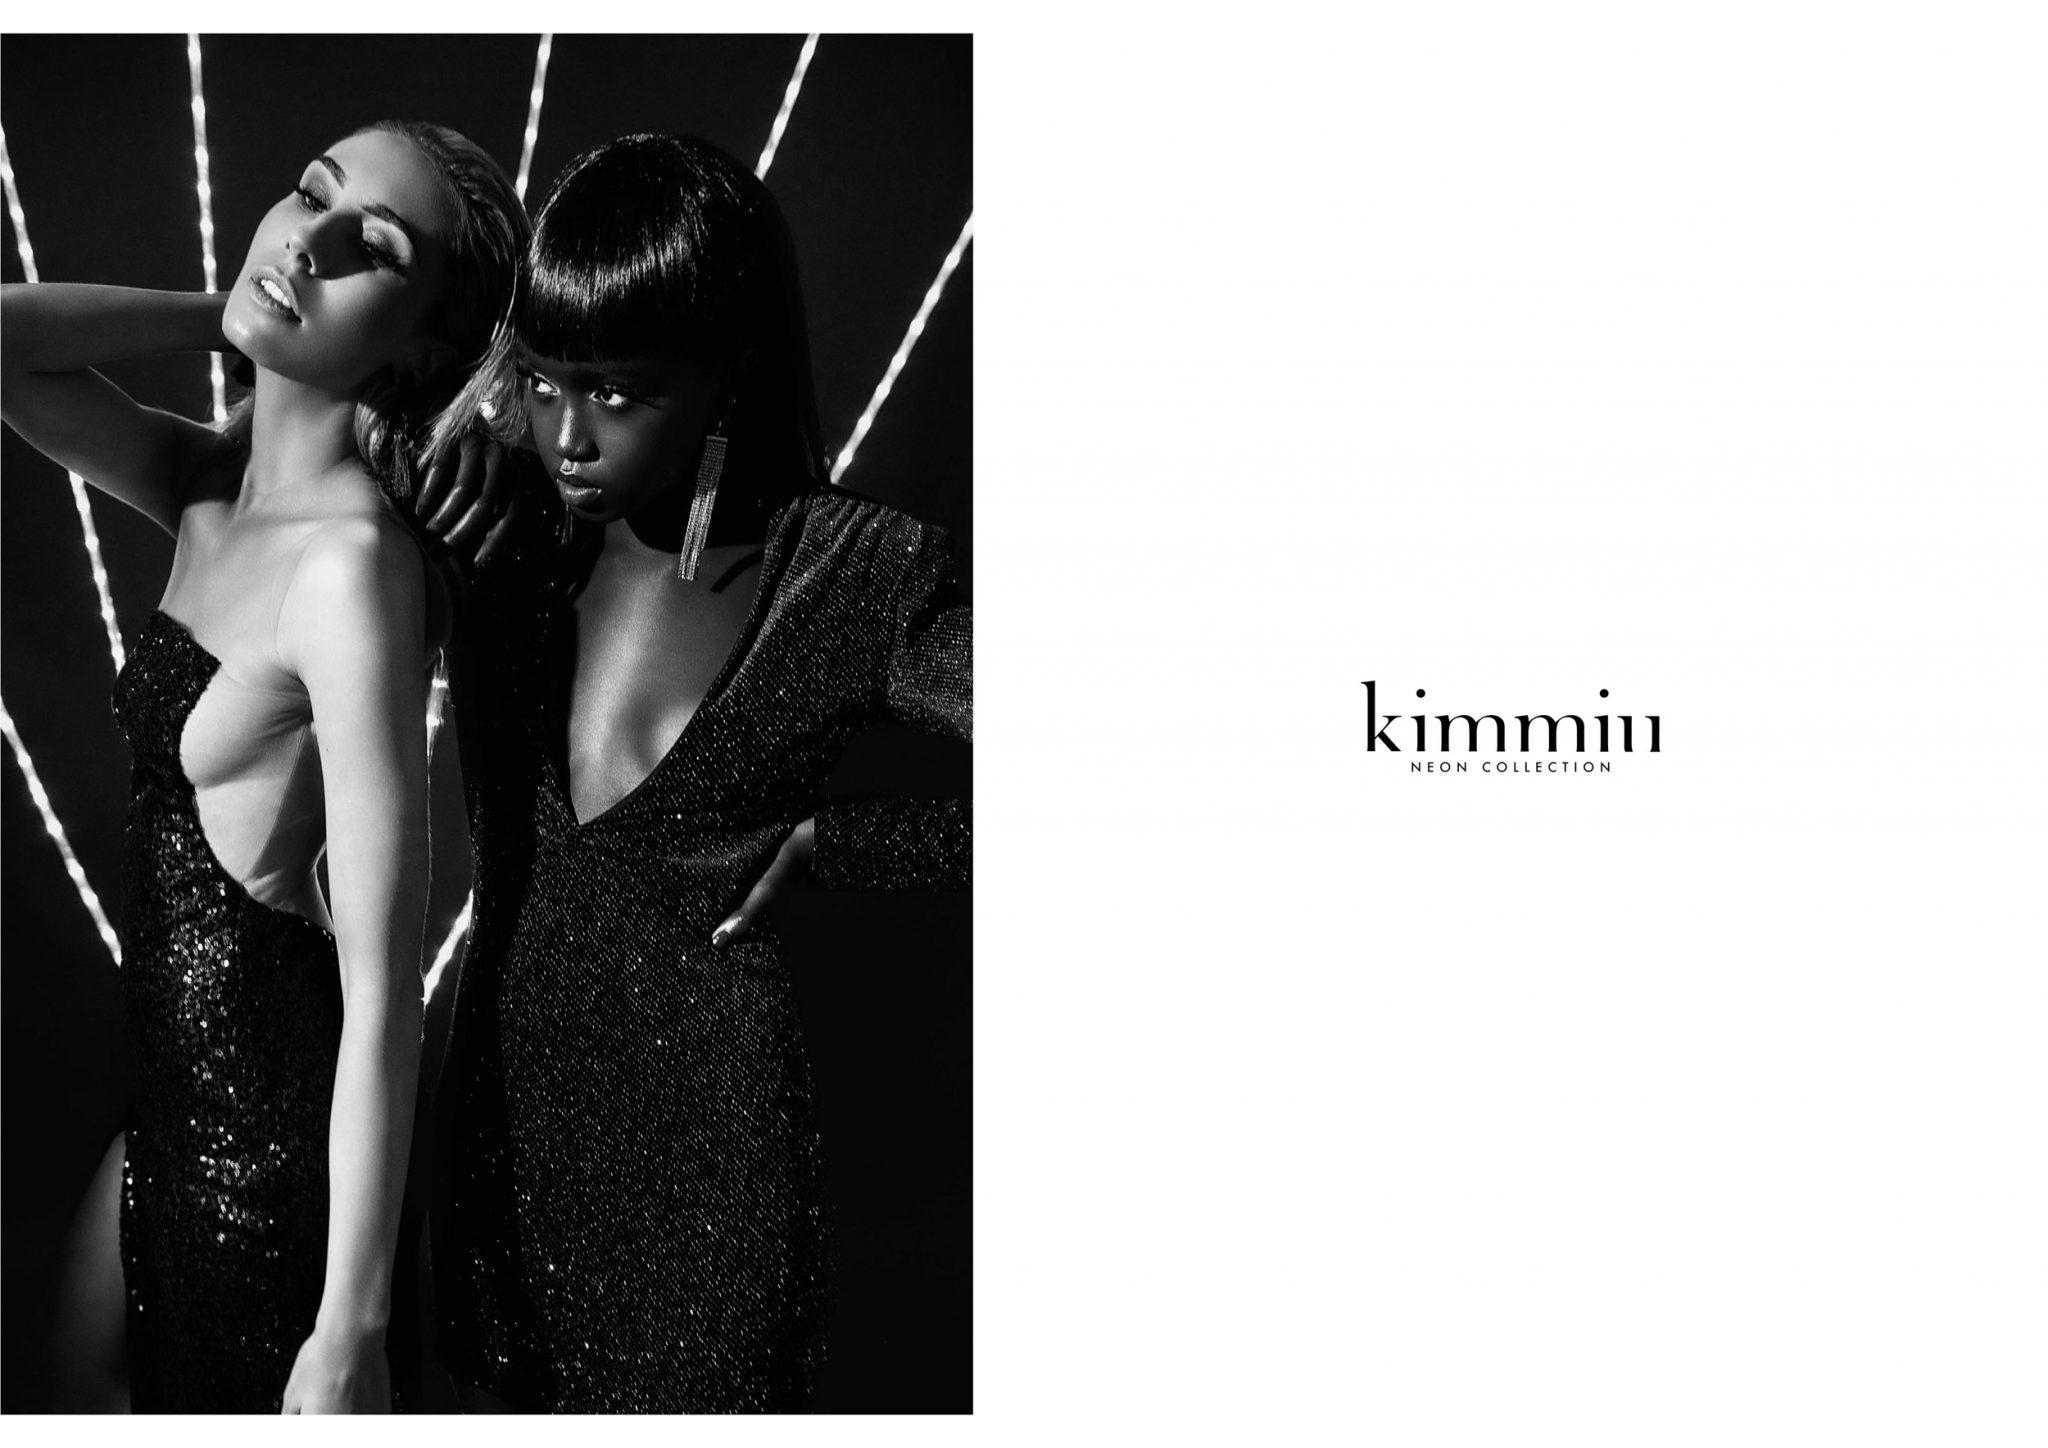 KIMMIU_Campaign_Spreads_Web0002